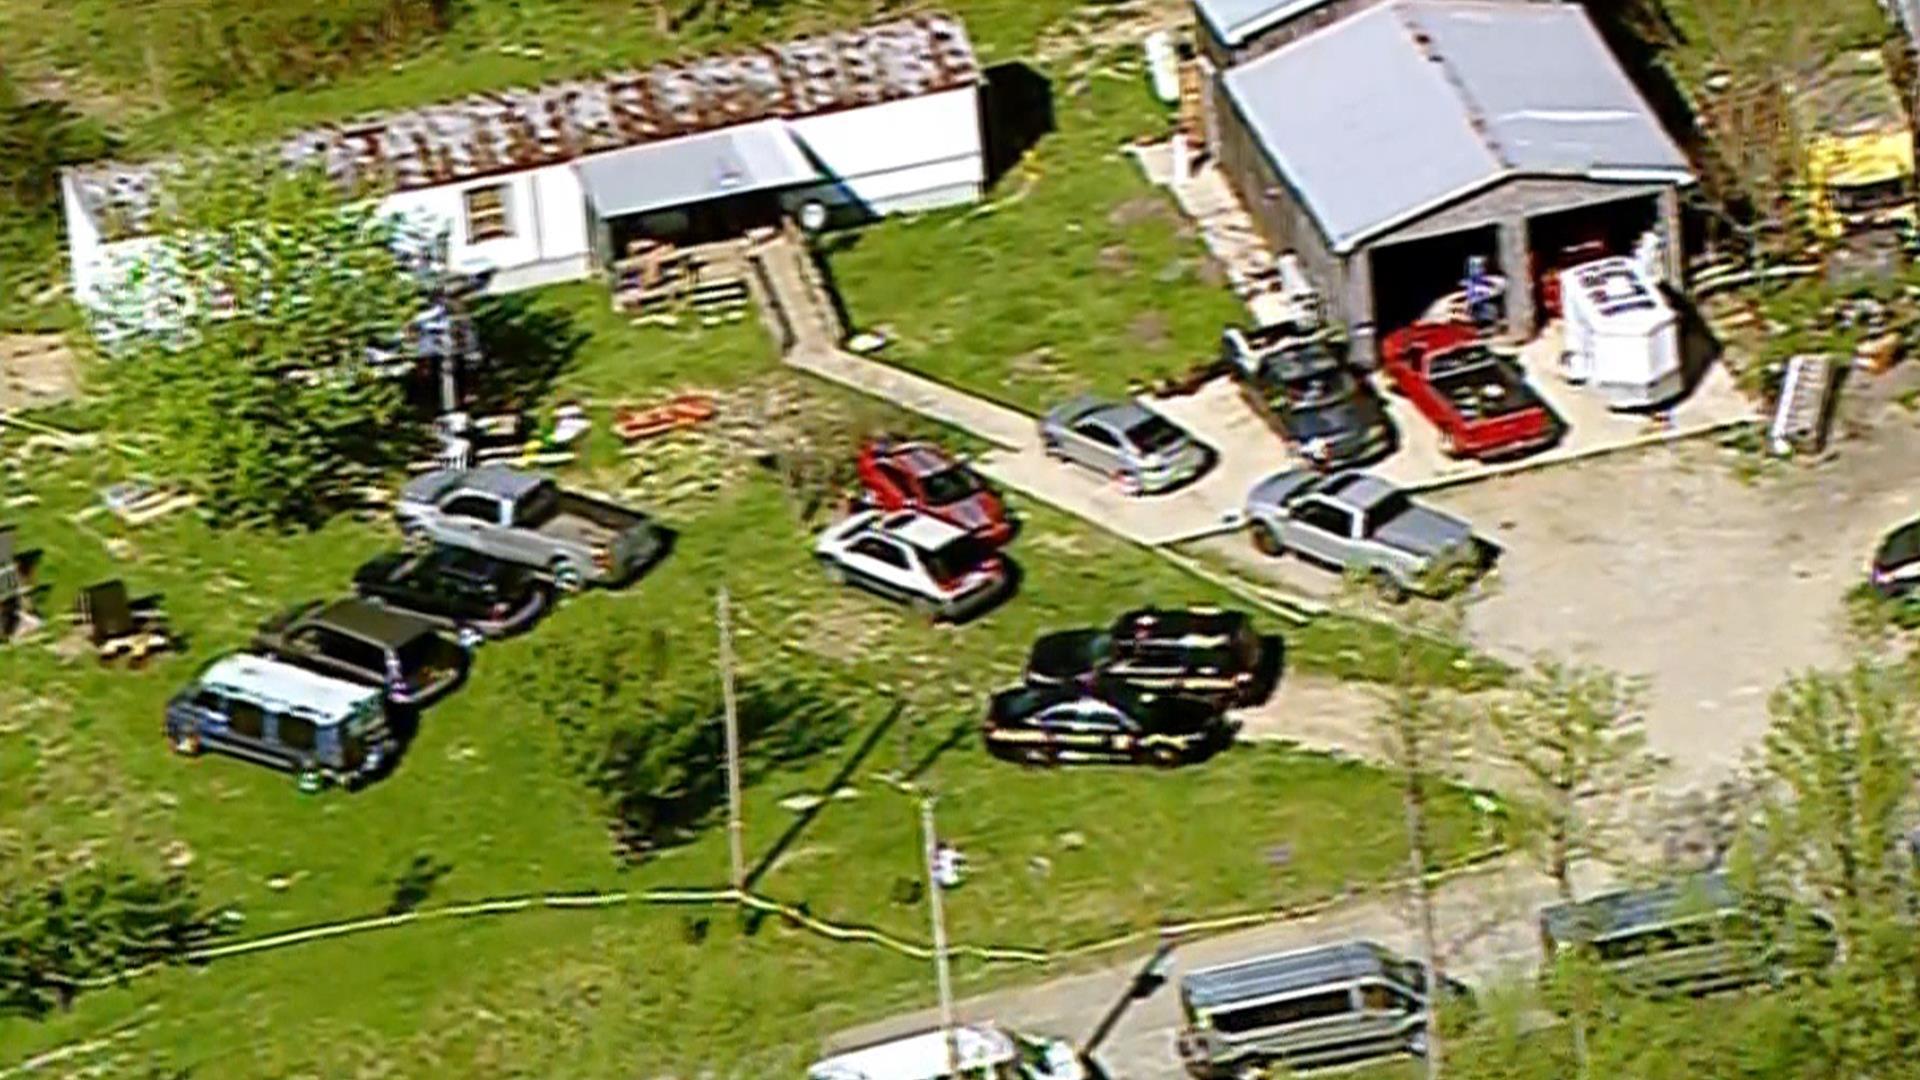 piketon massacre marijuana grow operations found at scenes of